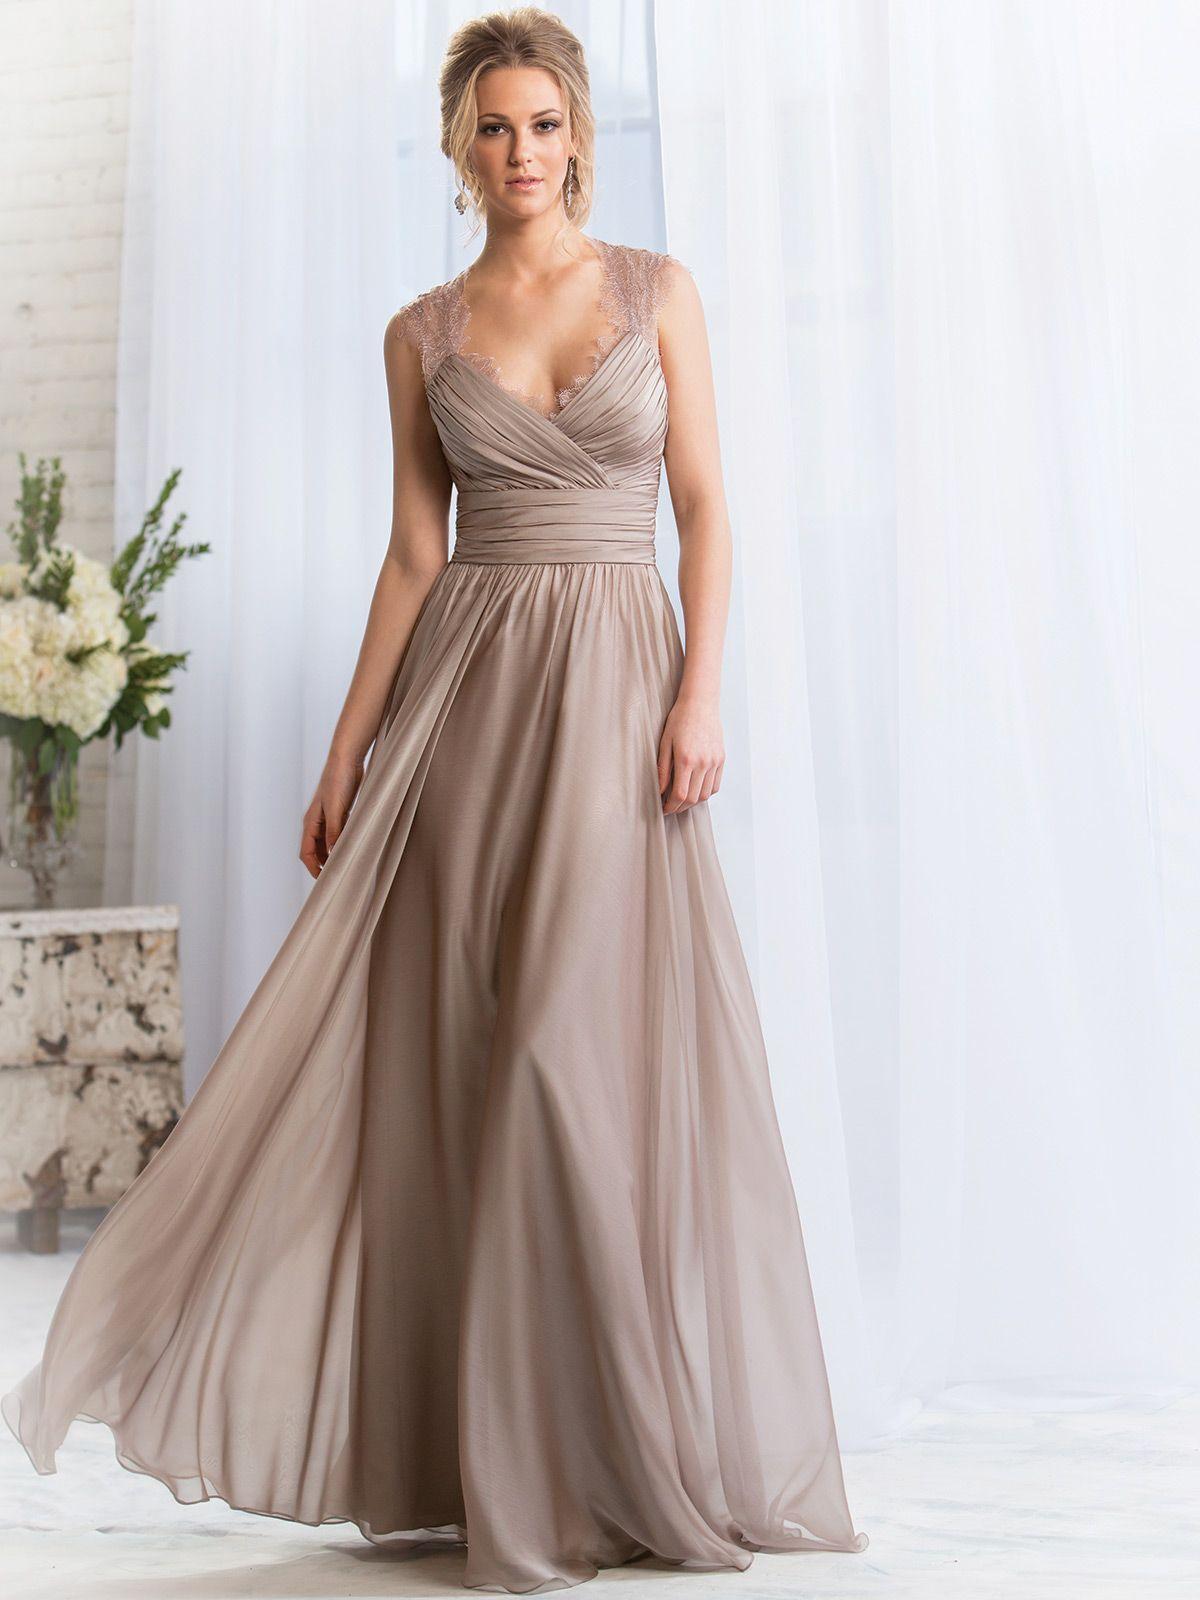 af0ad759c59 Belsoie Bridesmaid Dress L164057 Dimitradesigns Wedding Sept. Home Bridesmaids  Belsoie L194004 L194004 Long V Neck ...